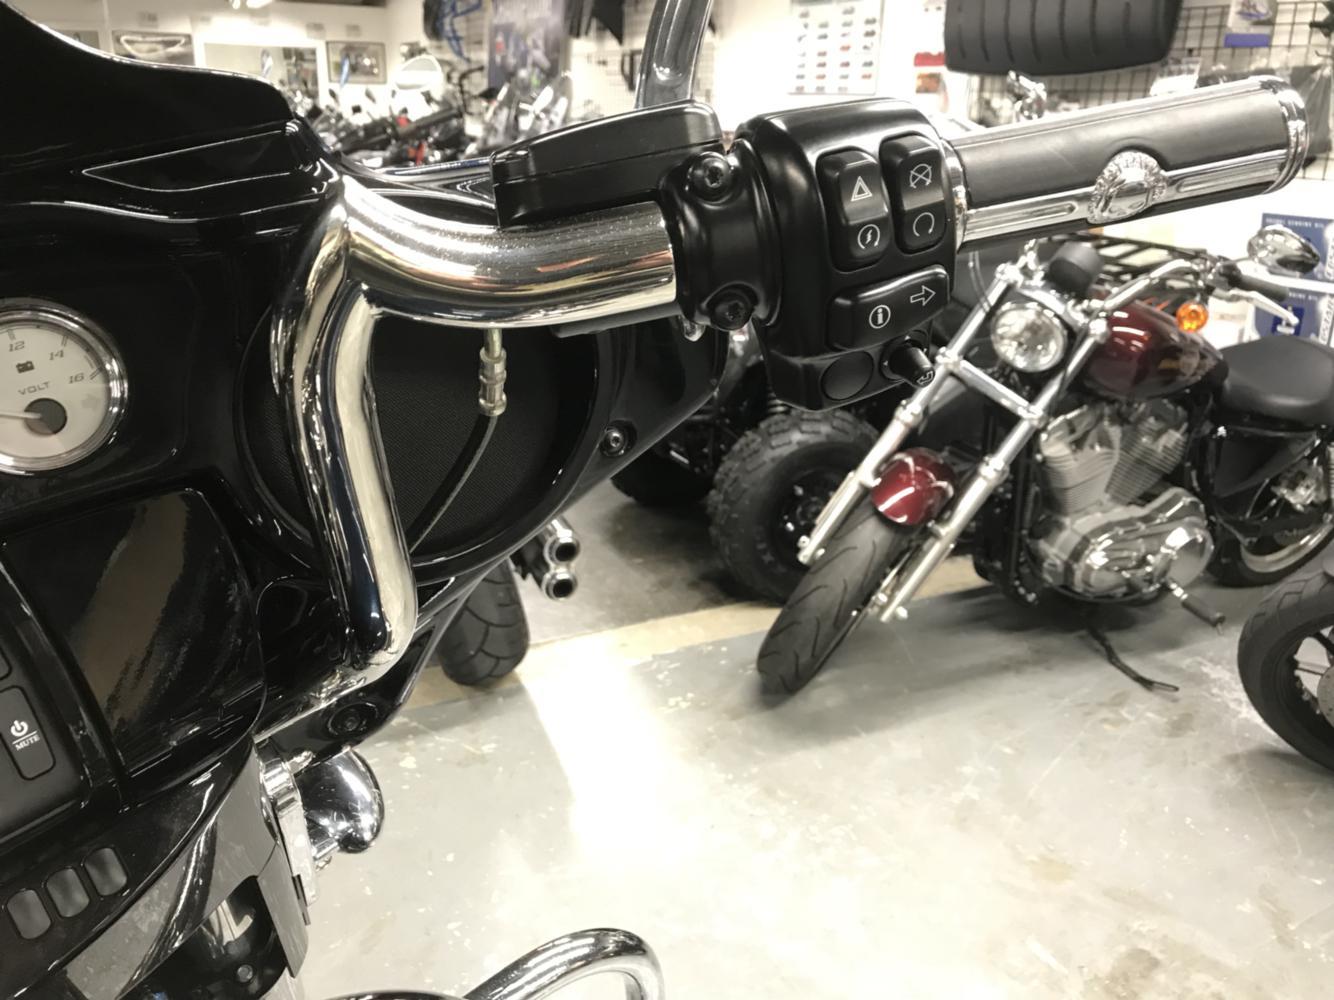 2016 Harley-Davidson FLHXS - STREET GLIDE SPECIAL 9